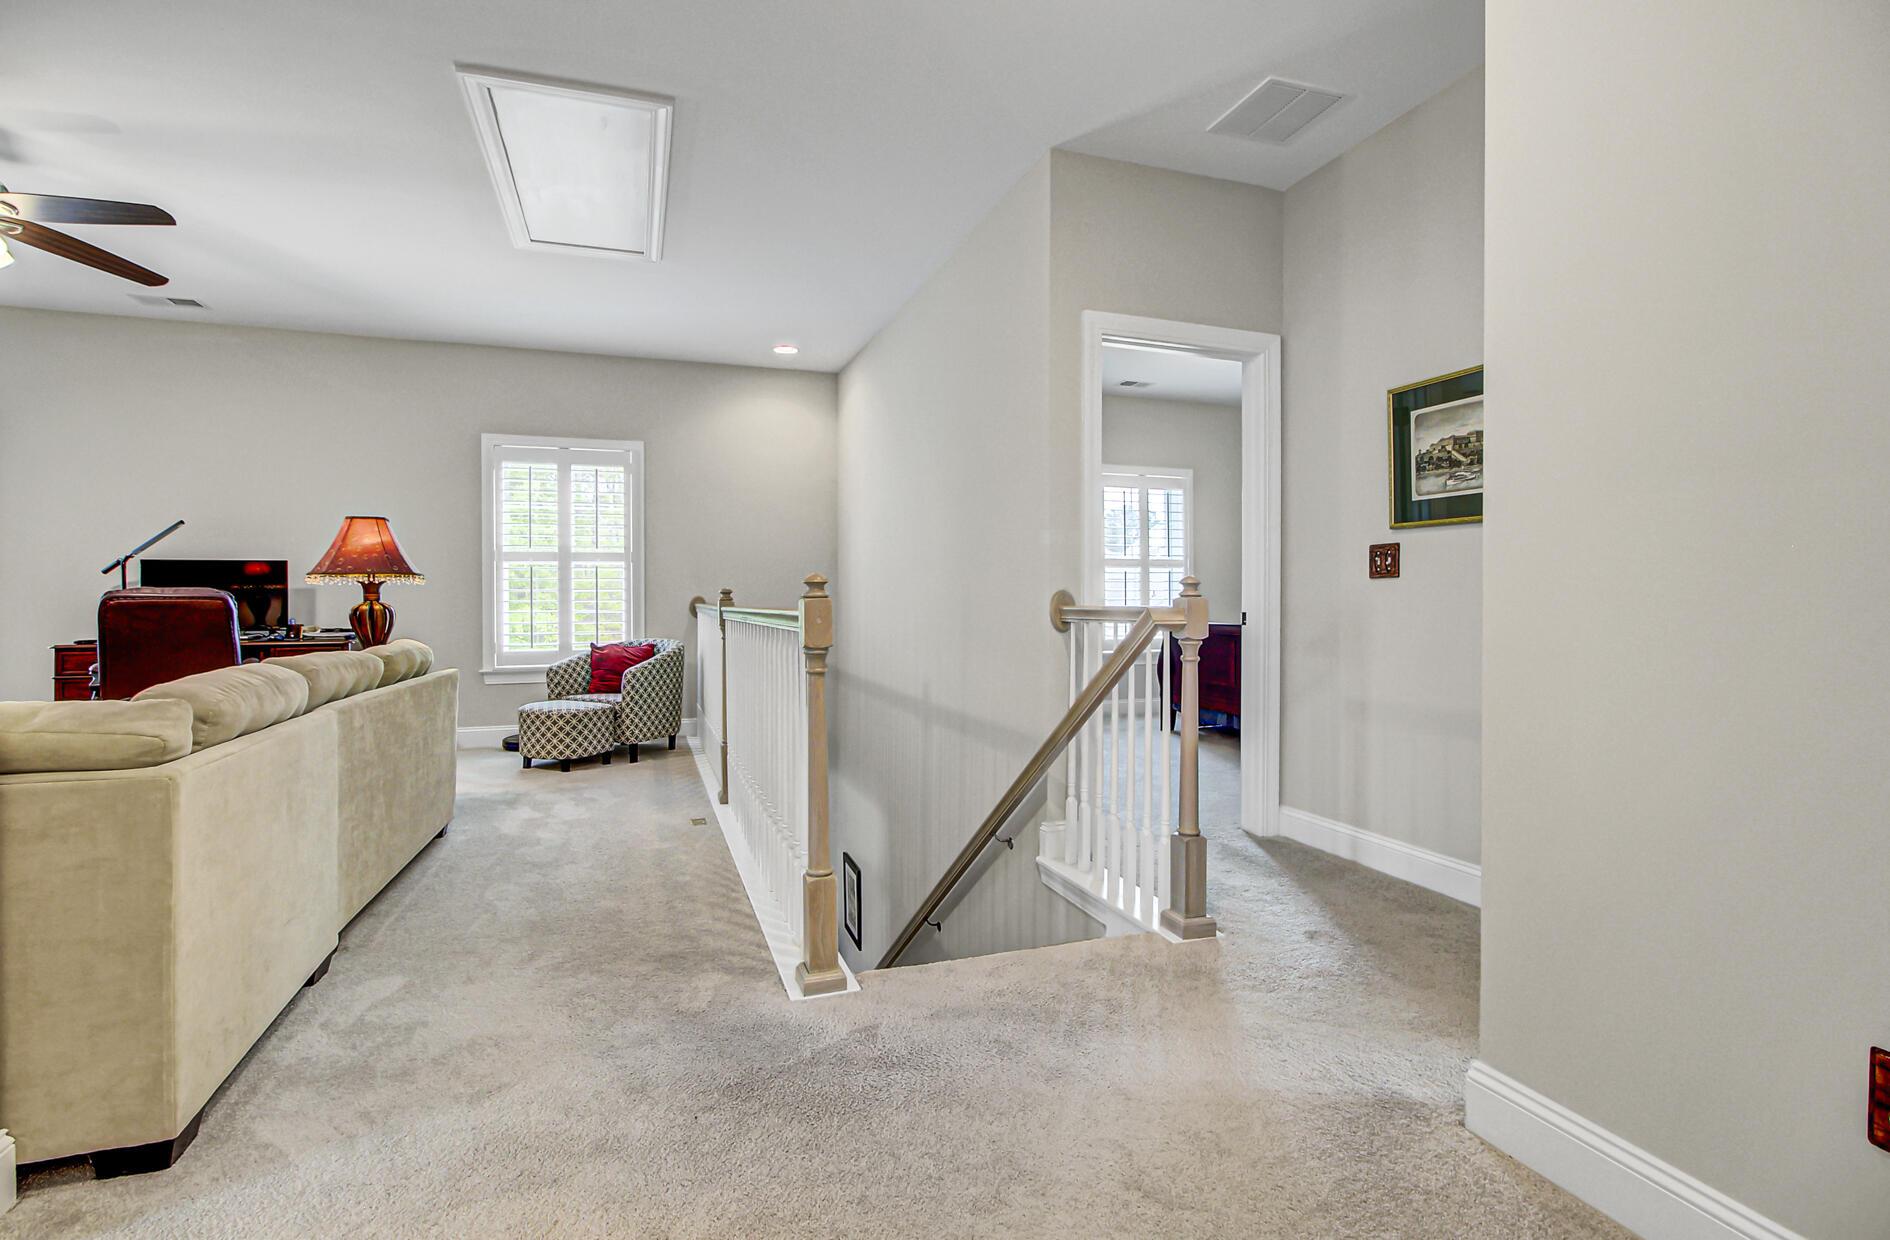 Park West Homes For Sale - 2824 Wagner, Mount Pleasant, SC - 3